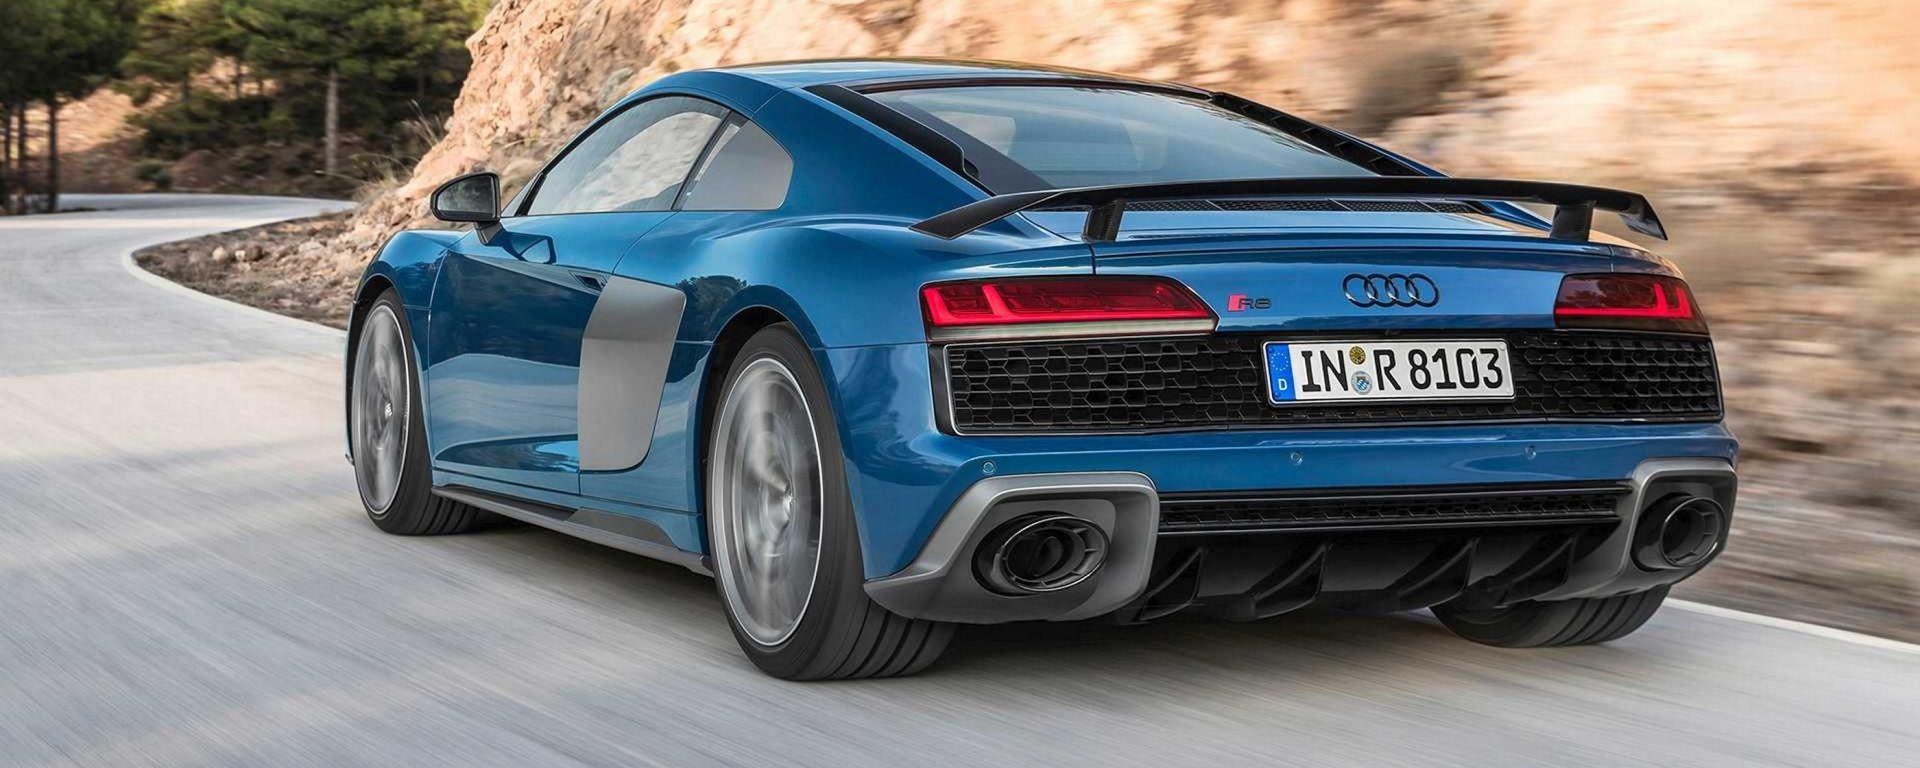 Audi R8 2019: restyling per coupé e spyder, rimane il V10